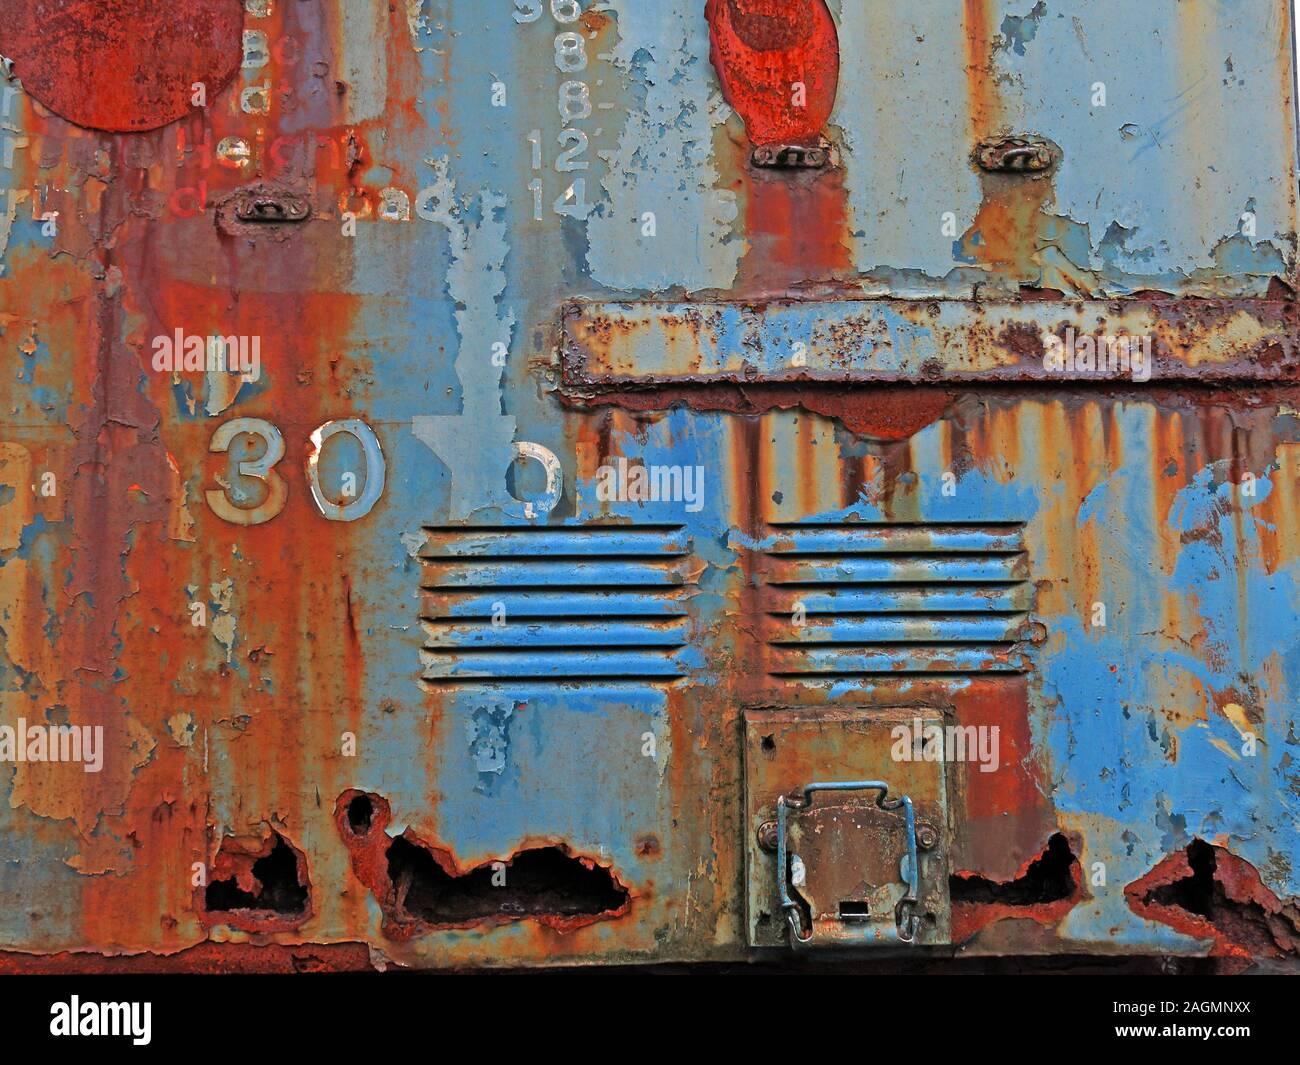 HotpixUK,@HotpixUK,GoTonySmith,Crewe works,rail,railway,trains,engine,transport,history,BR,British Railways,UK,Great Britain,Crewe Works,door,exterior,abstract colors,rust,scrapyard,scrap,locomotive,Rusting,heritage,Railway heritage